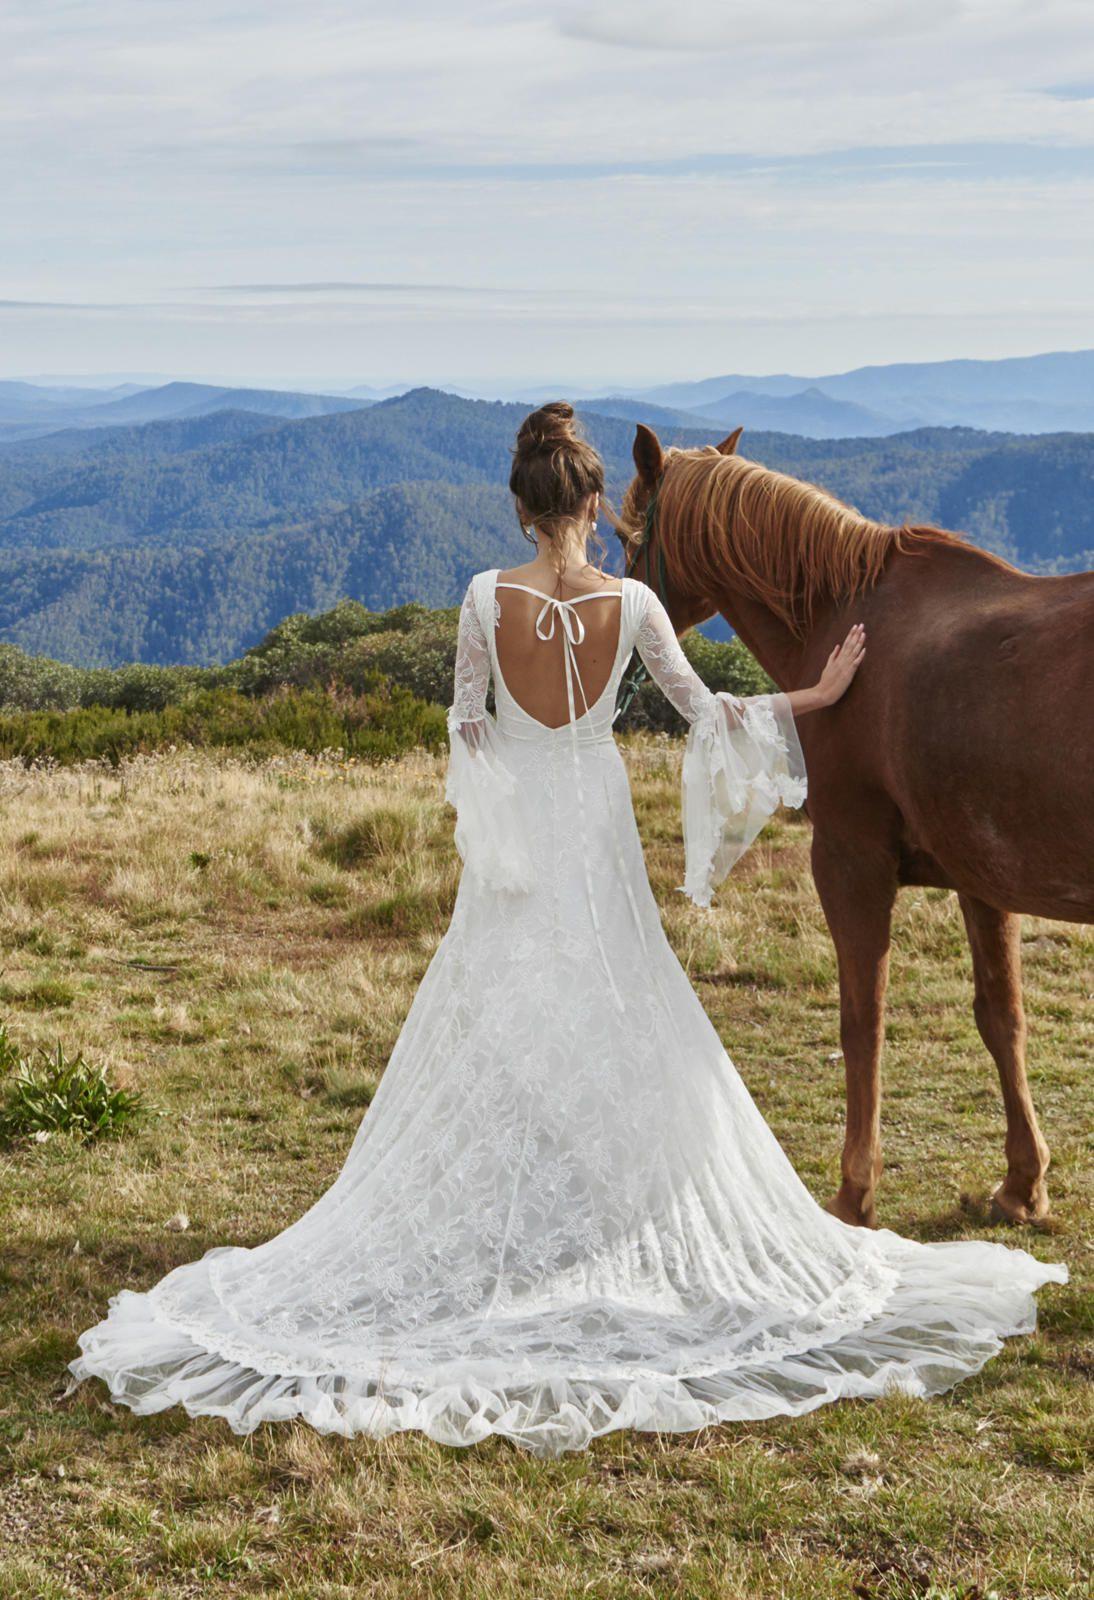 Hochzeitskleid rückenfrei Saum lang echt romantisch